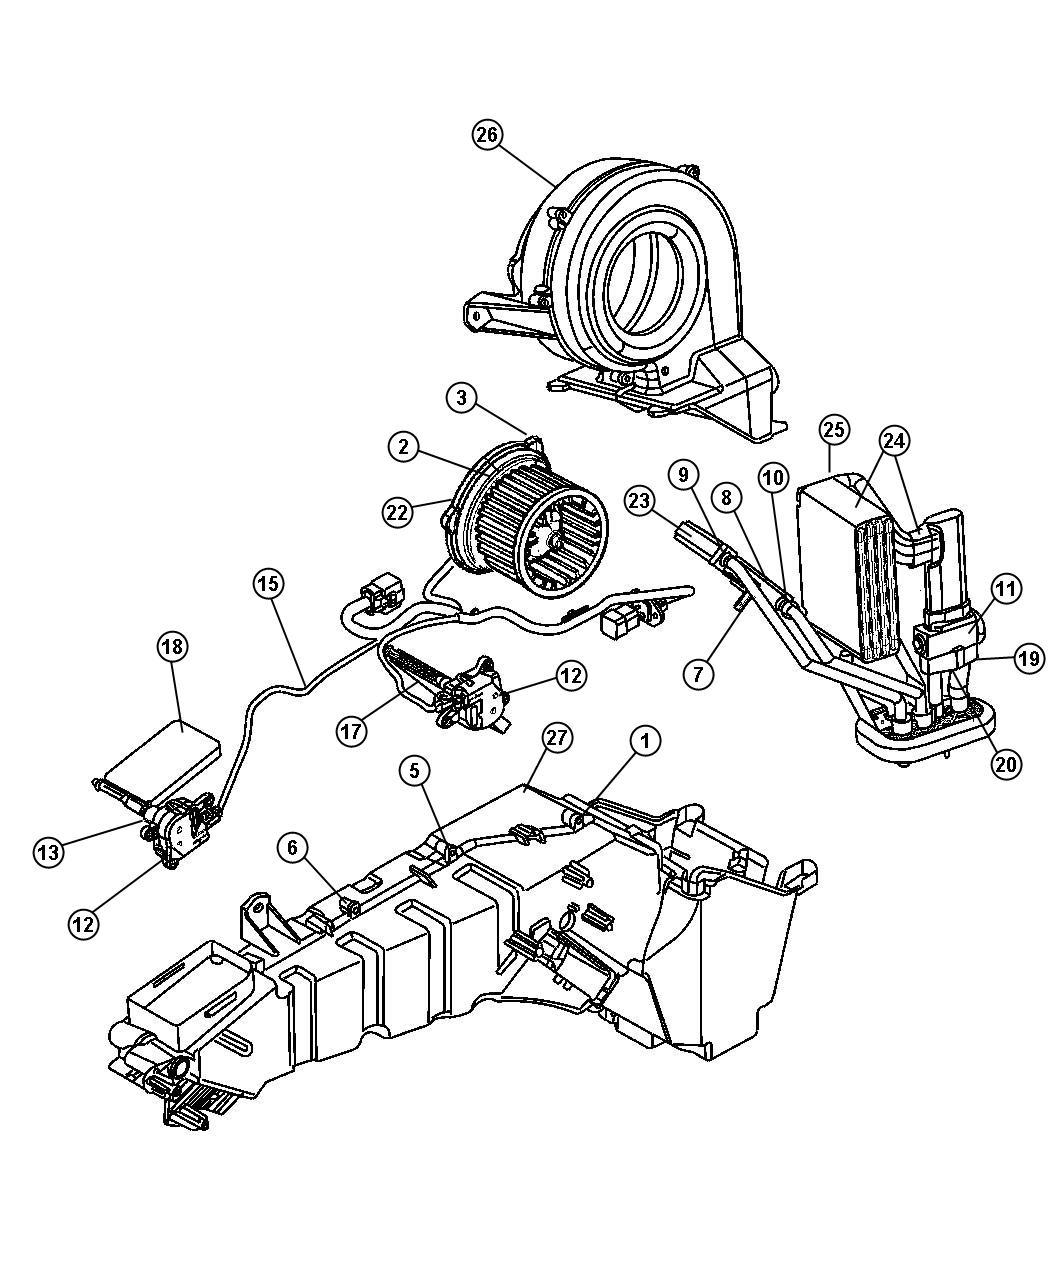 2001 Dodge Durango Motor. Blower with wheel. Up to 1-3-08